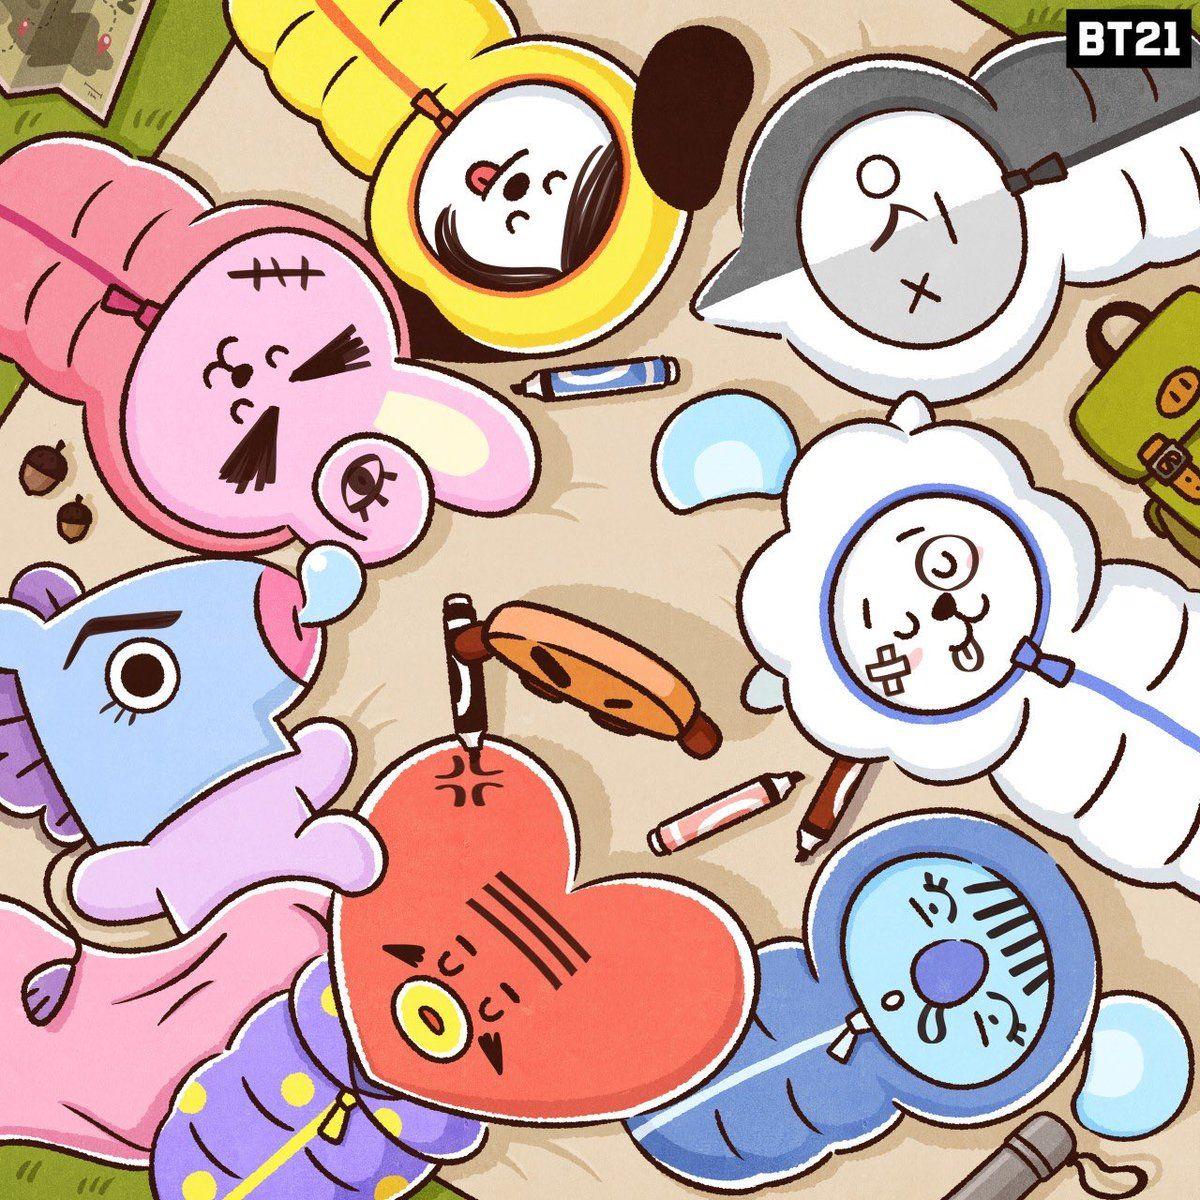 Bt21 On Twitter Line Friends Bts Wallpaper Bts Drawings